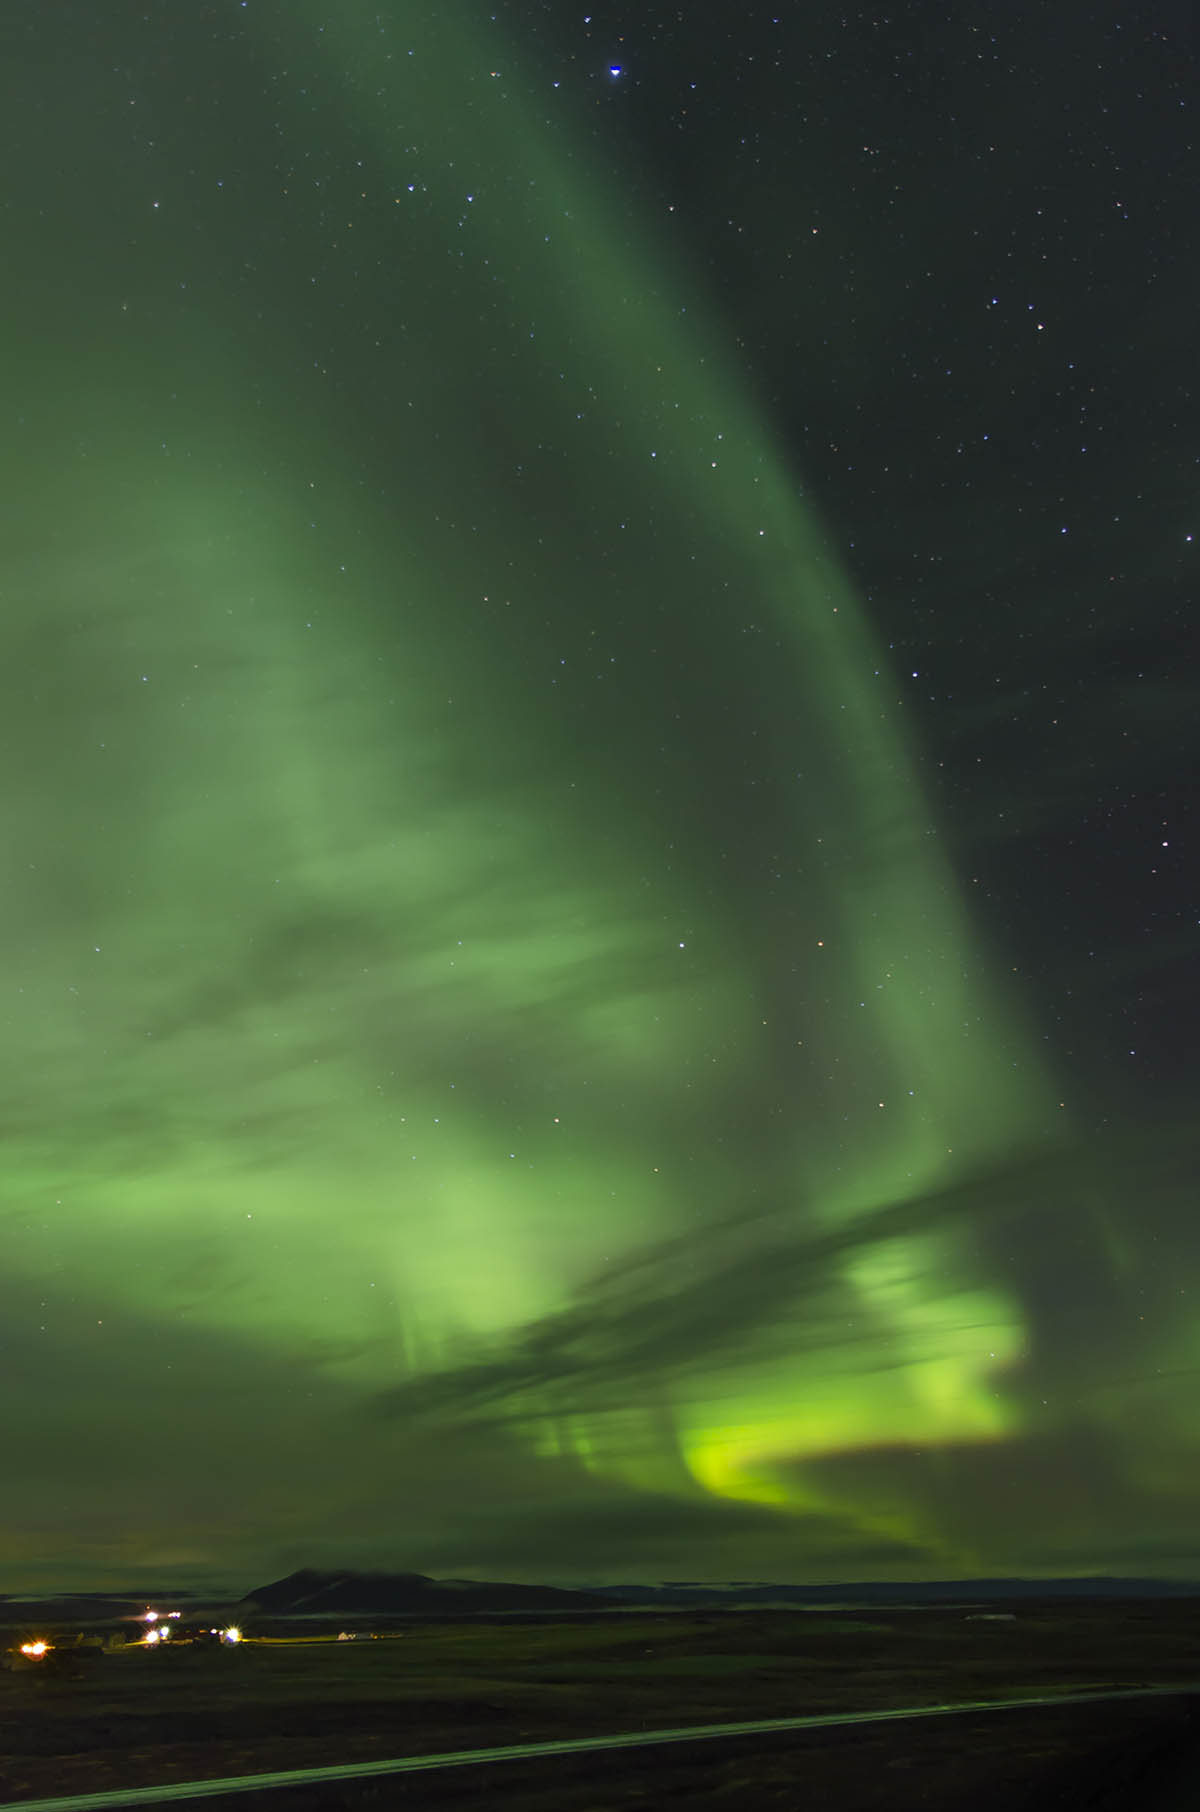 PhotoFly Travel Club | iceland Northern Lights Vert Crop | PhotoFly Travel Club